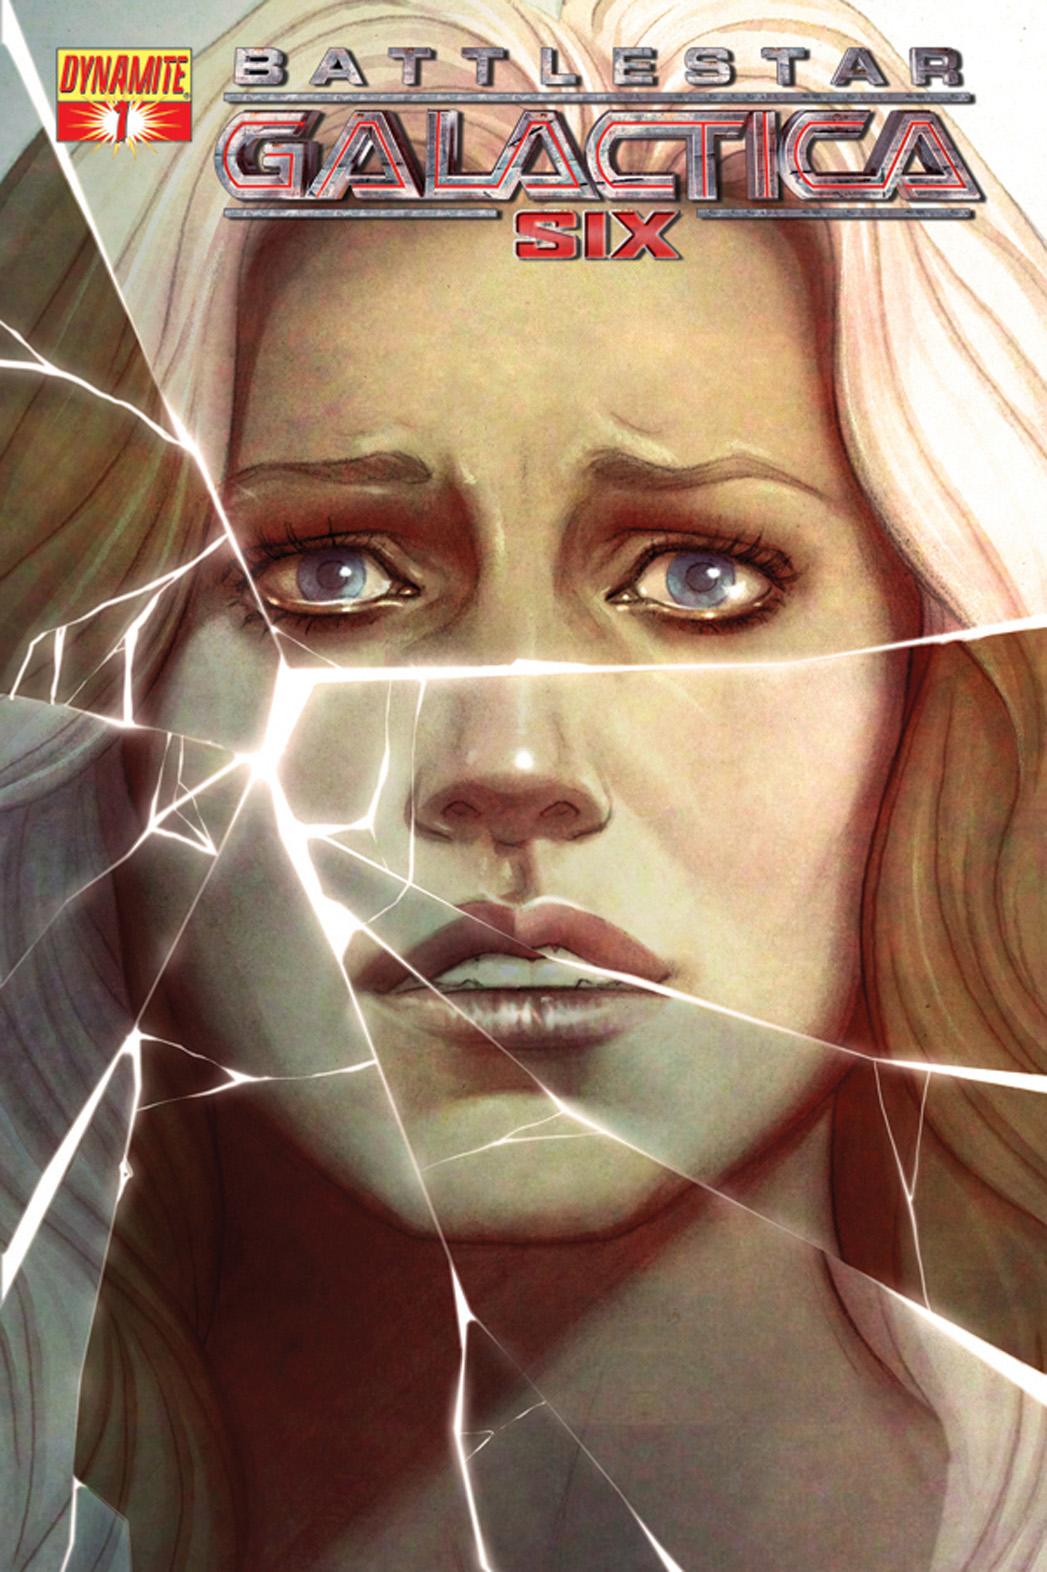 Battlestar Galactica Six Cover - P 2014